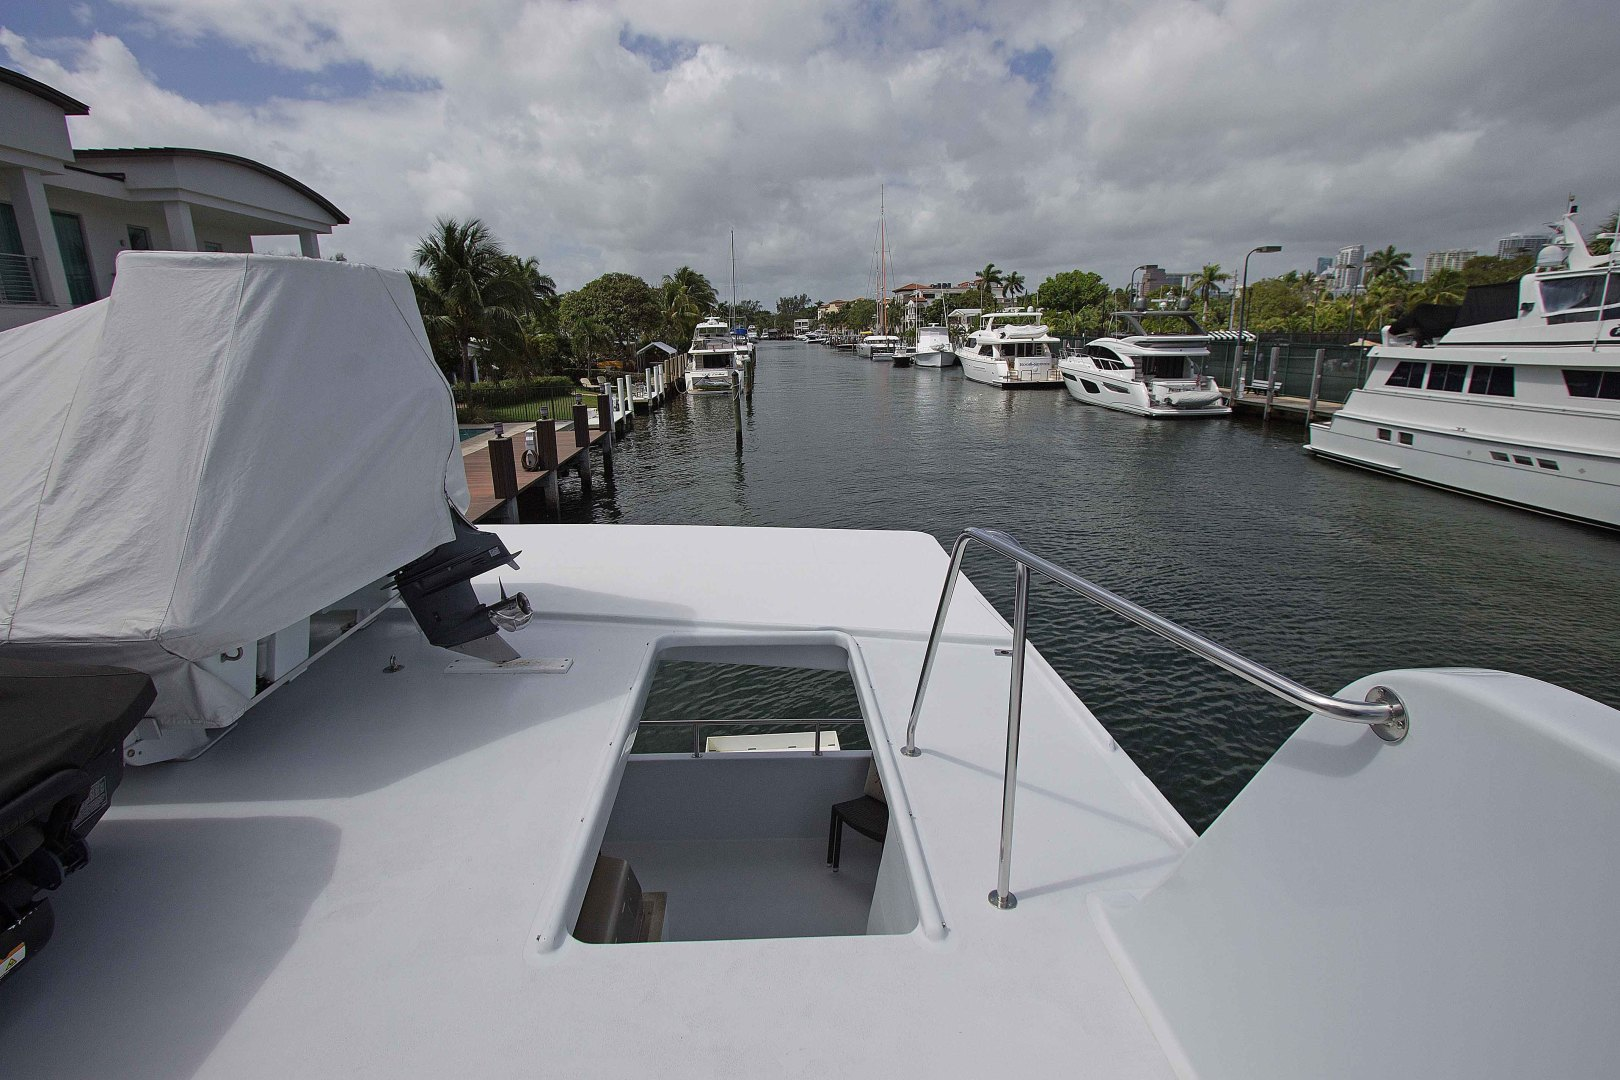 Theriault & Son-Custom Catamaran 2000-Slumber Venture Fort Lauderdale-Florida-United States-1625422 | Thumbnail